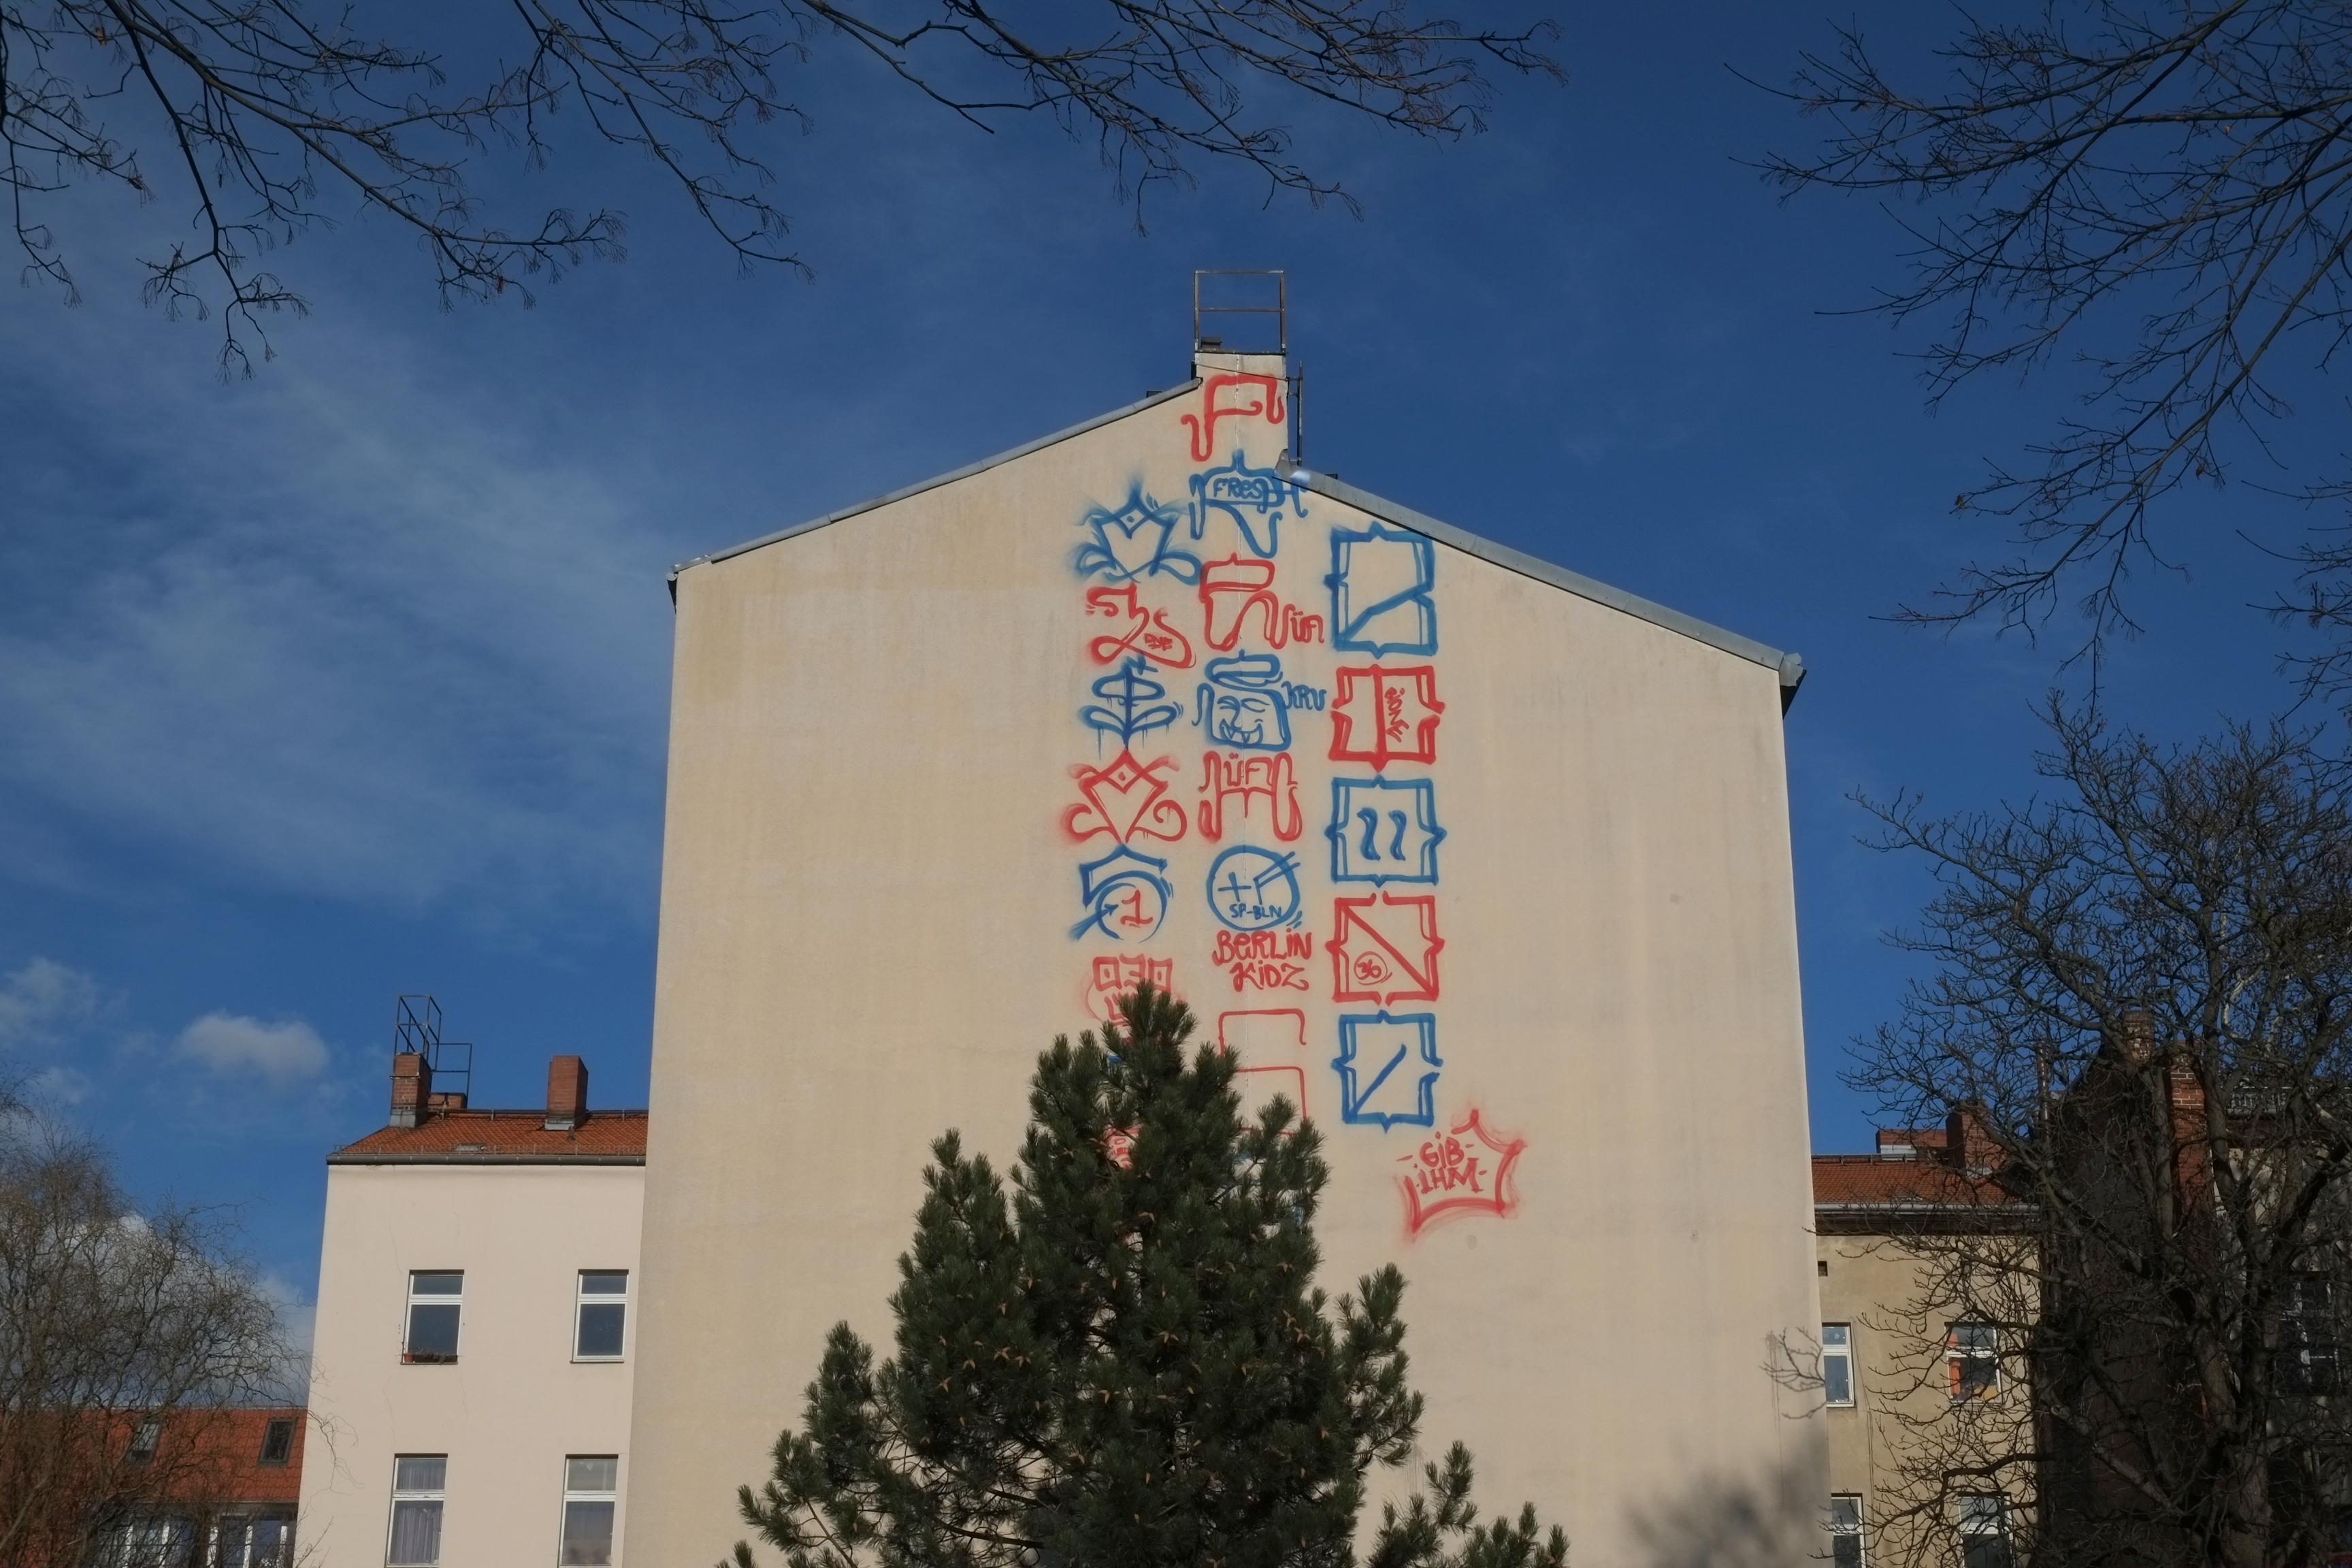 berlin streetart fundstücke – #002 – februar 2014